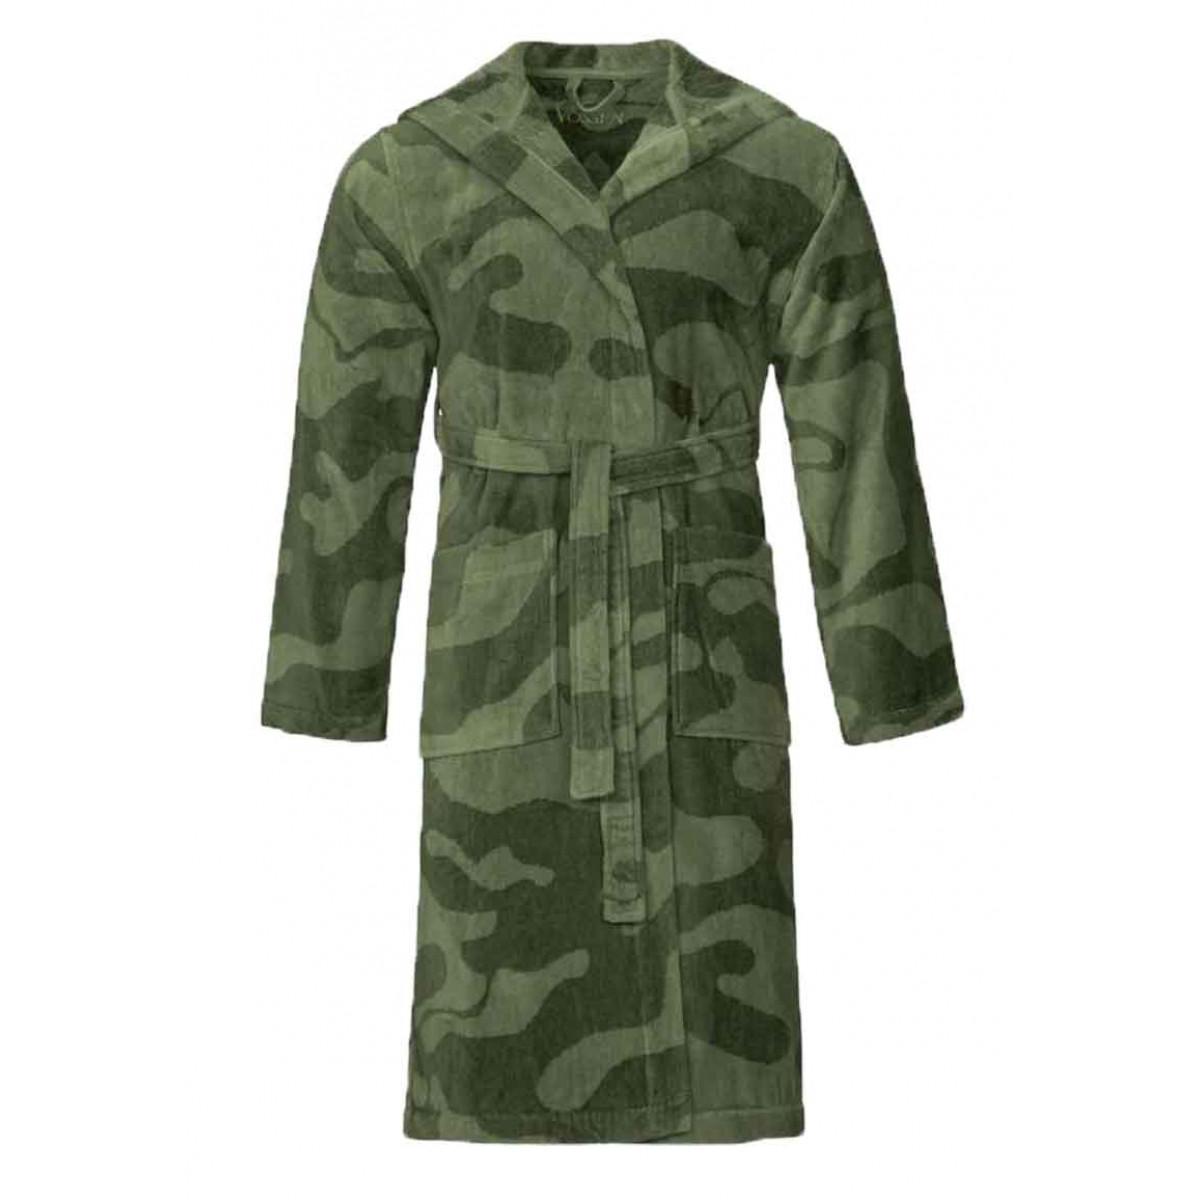 Legerprint badjas groen - unisex